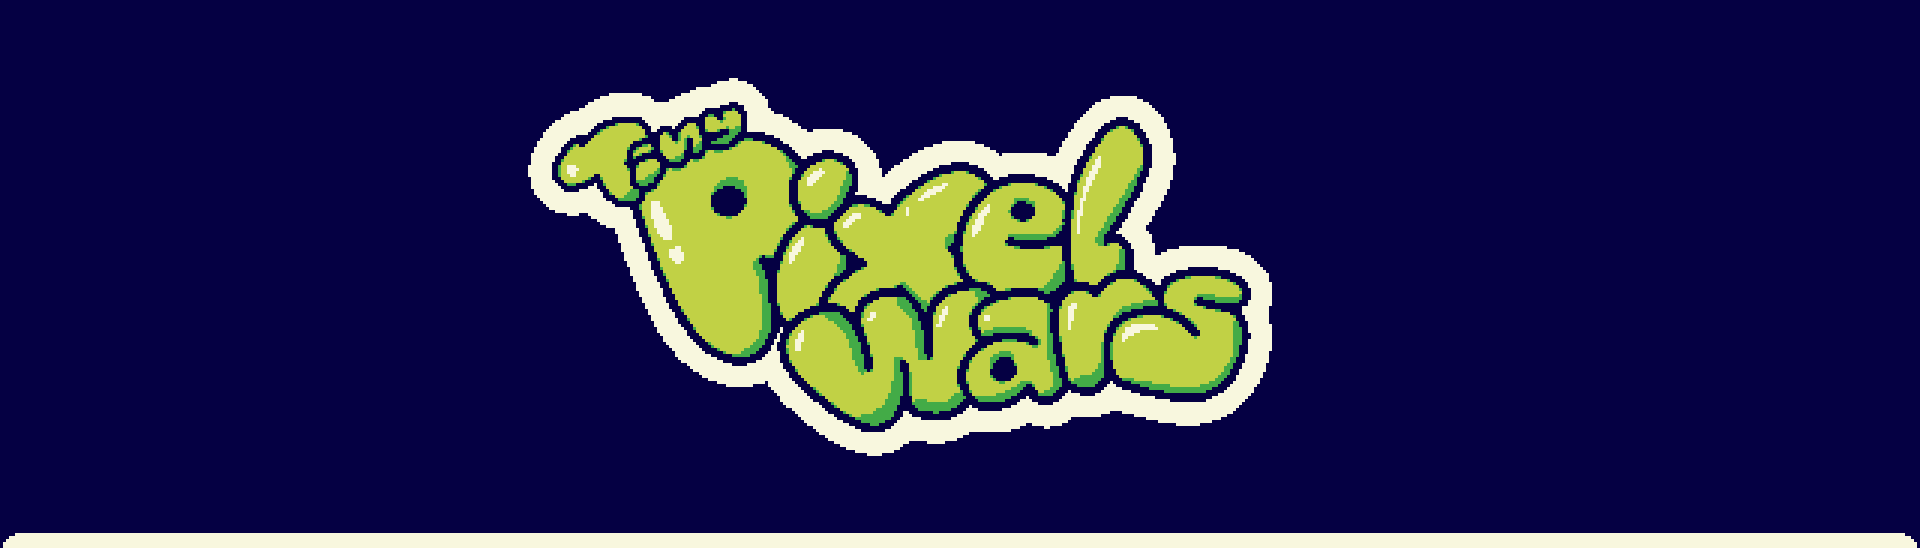 Tiny Pixel Wars